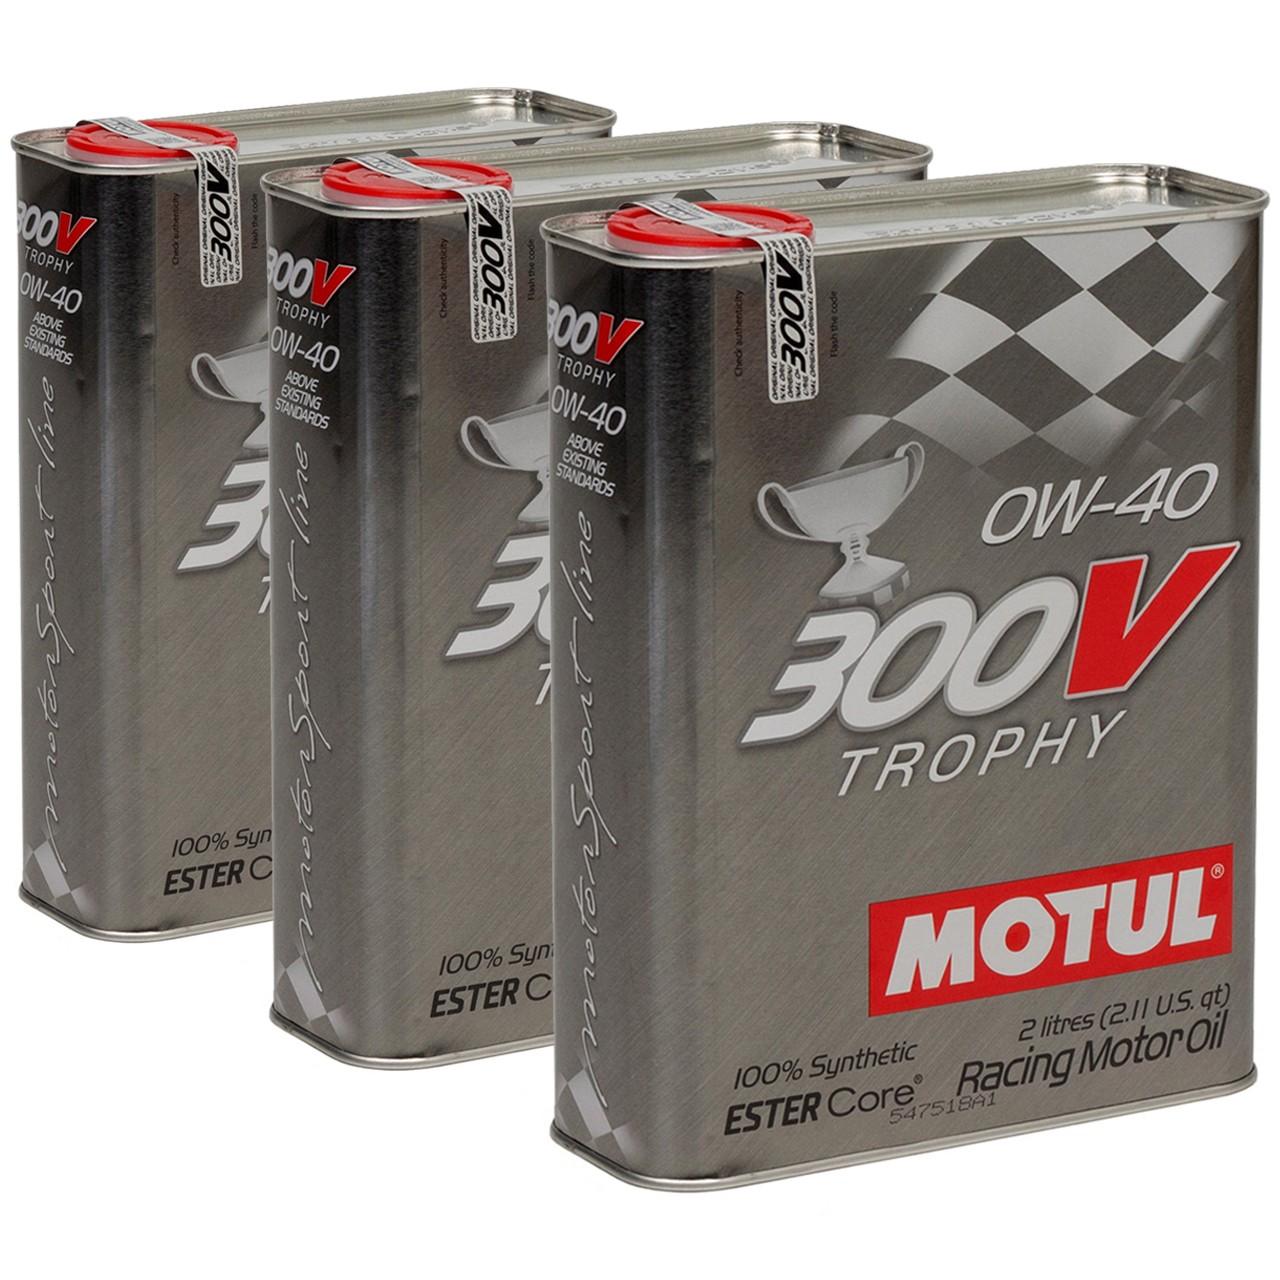 MOTUL 300V TROPHY RACING Motoröl Öl 0W40 100% Synthetic Ester Core - 6L 6 Liter